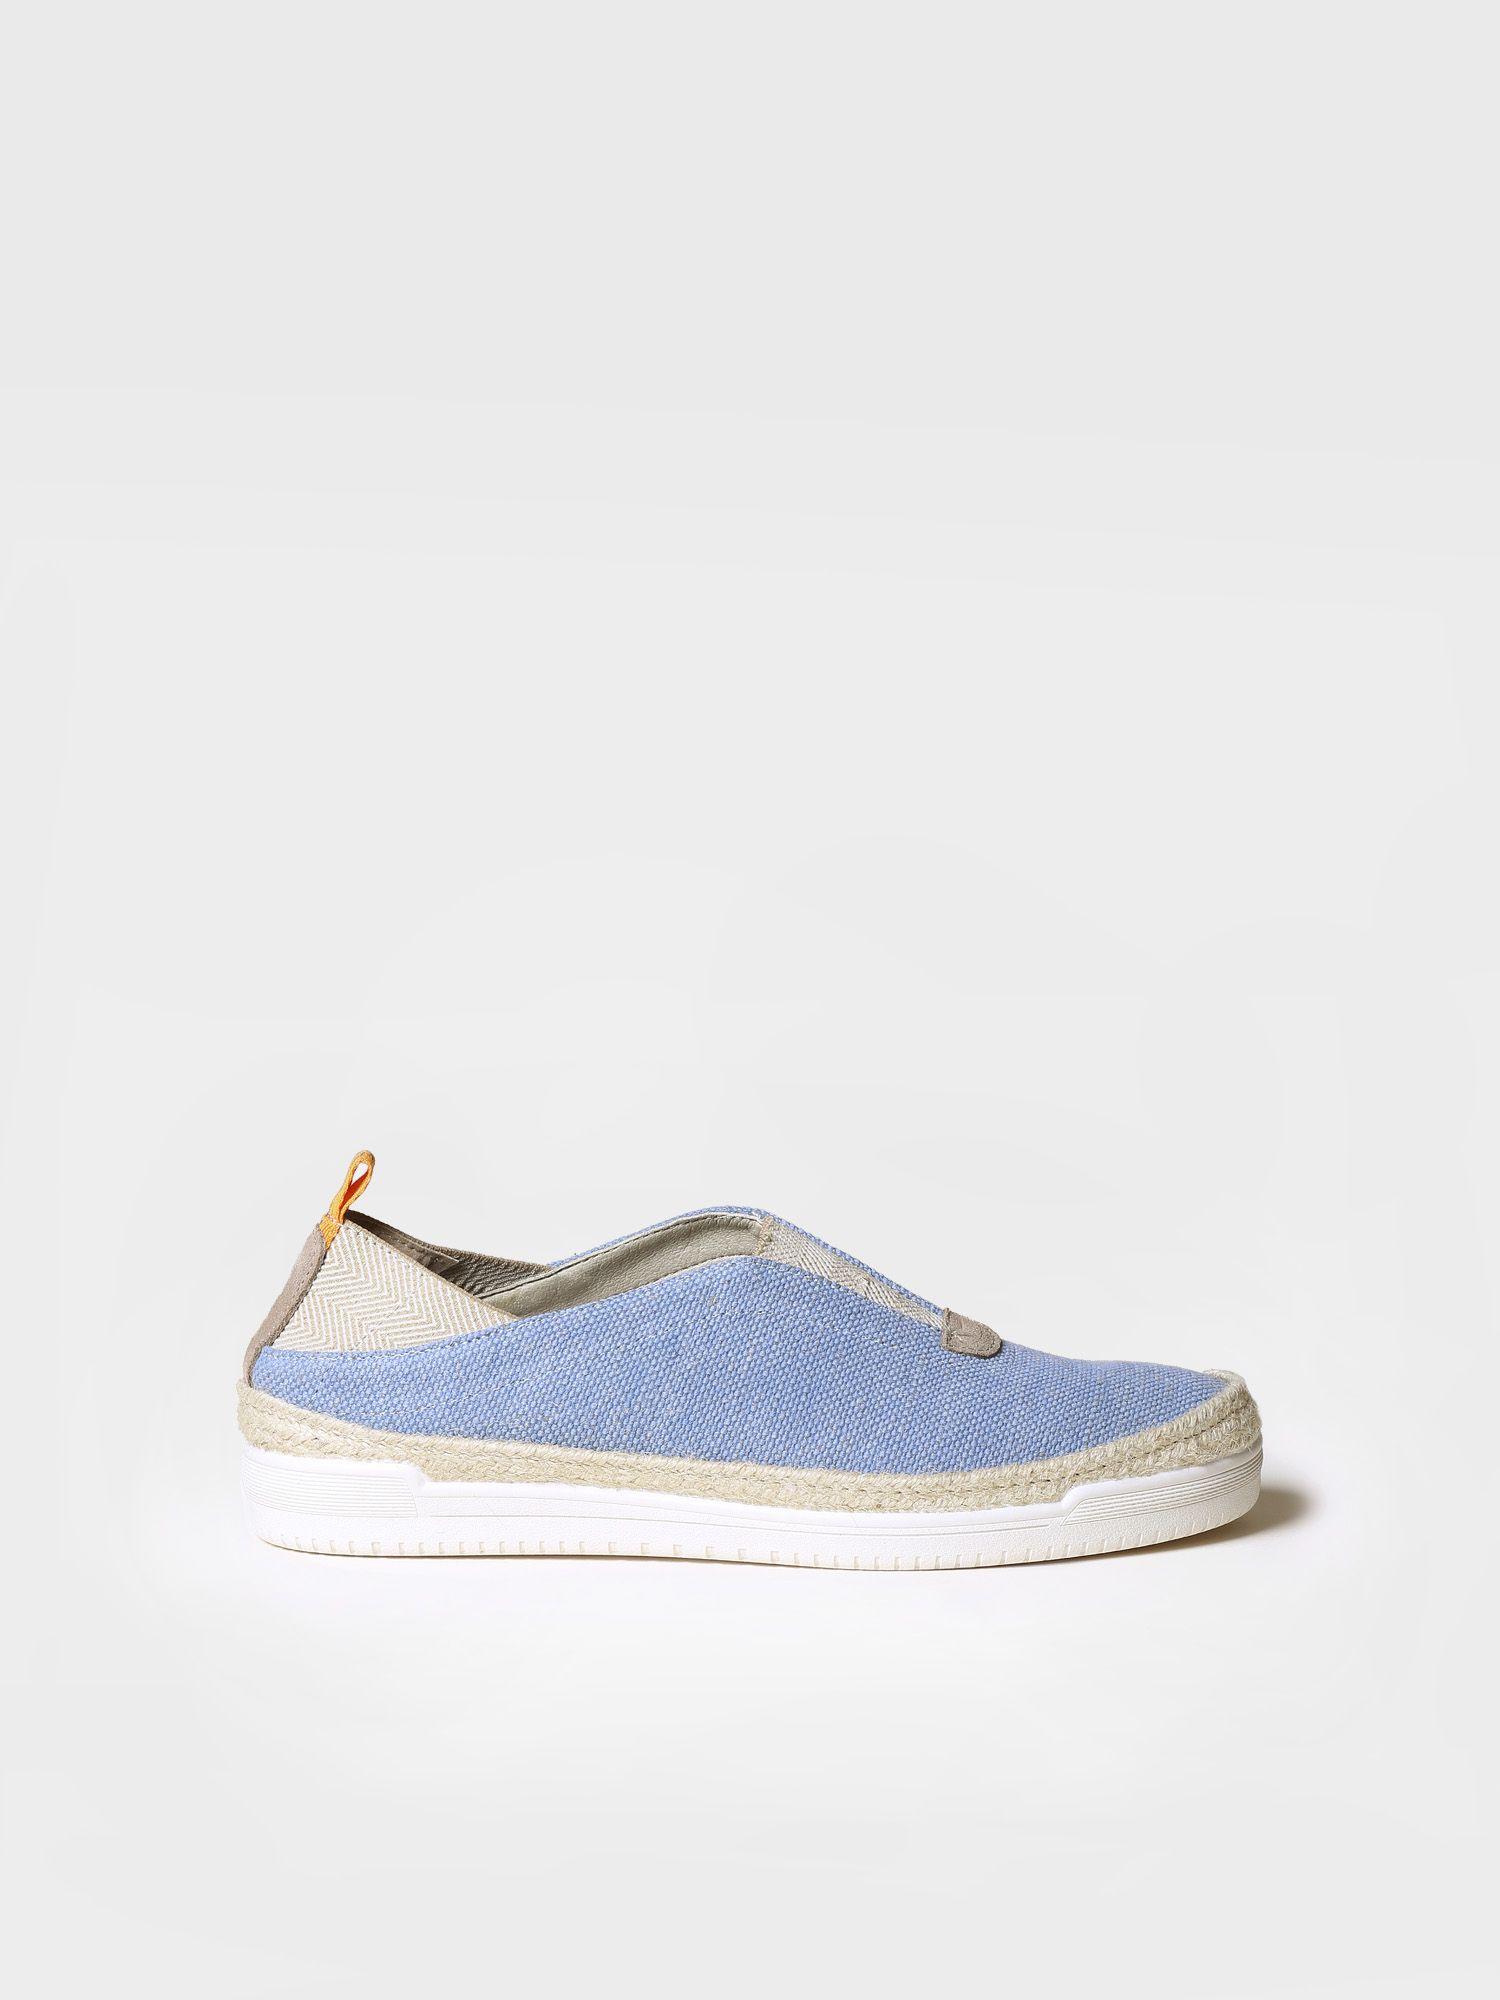 Sports shoes elastic fit - BALU-SU